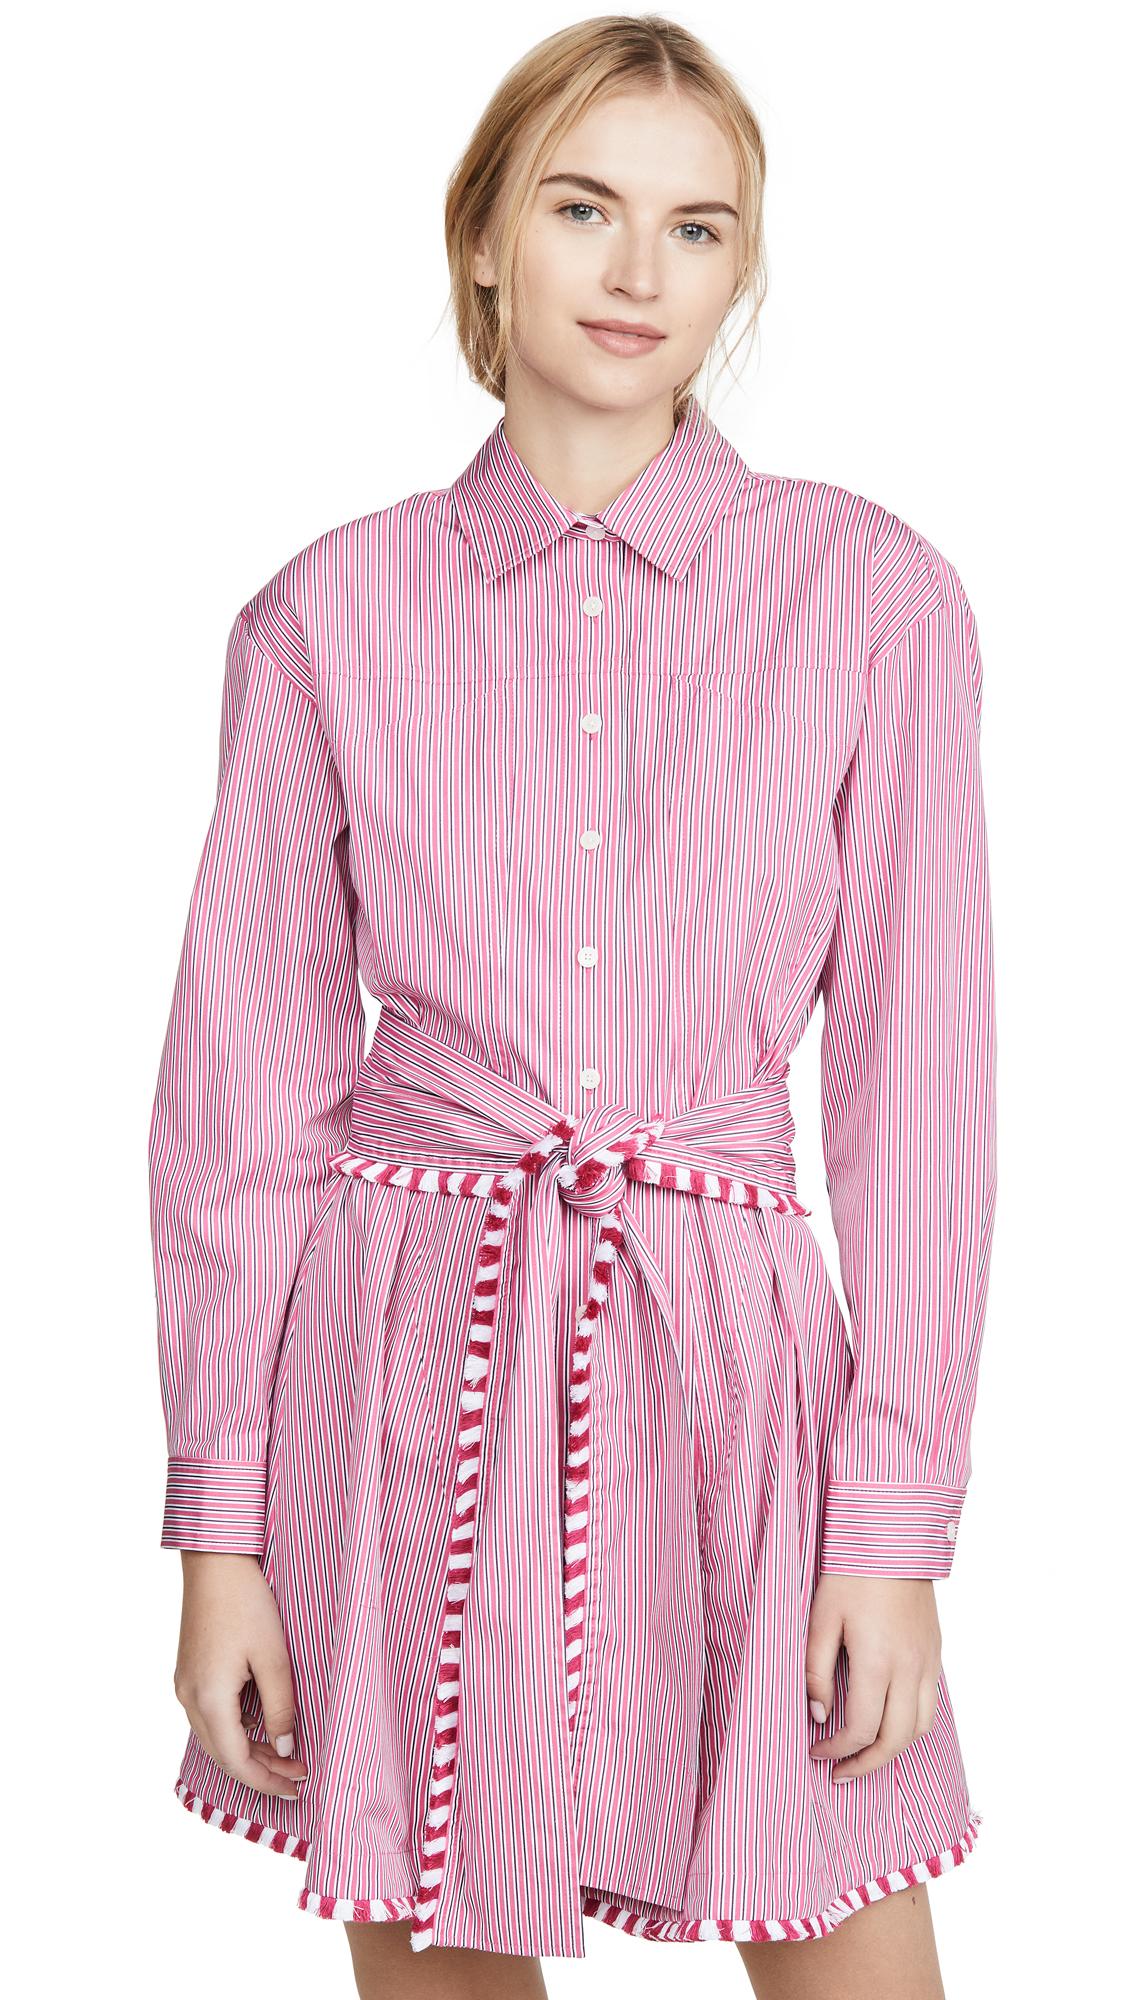 Derek Lam 10 Crosby Iona Belted Shirt Dress - 30% Off Sale